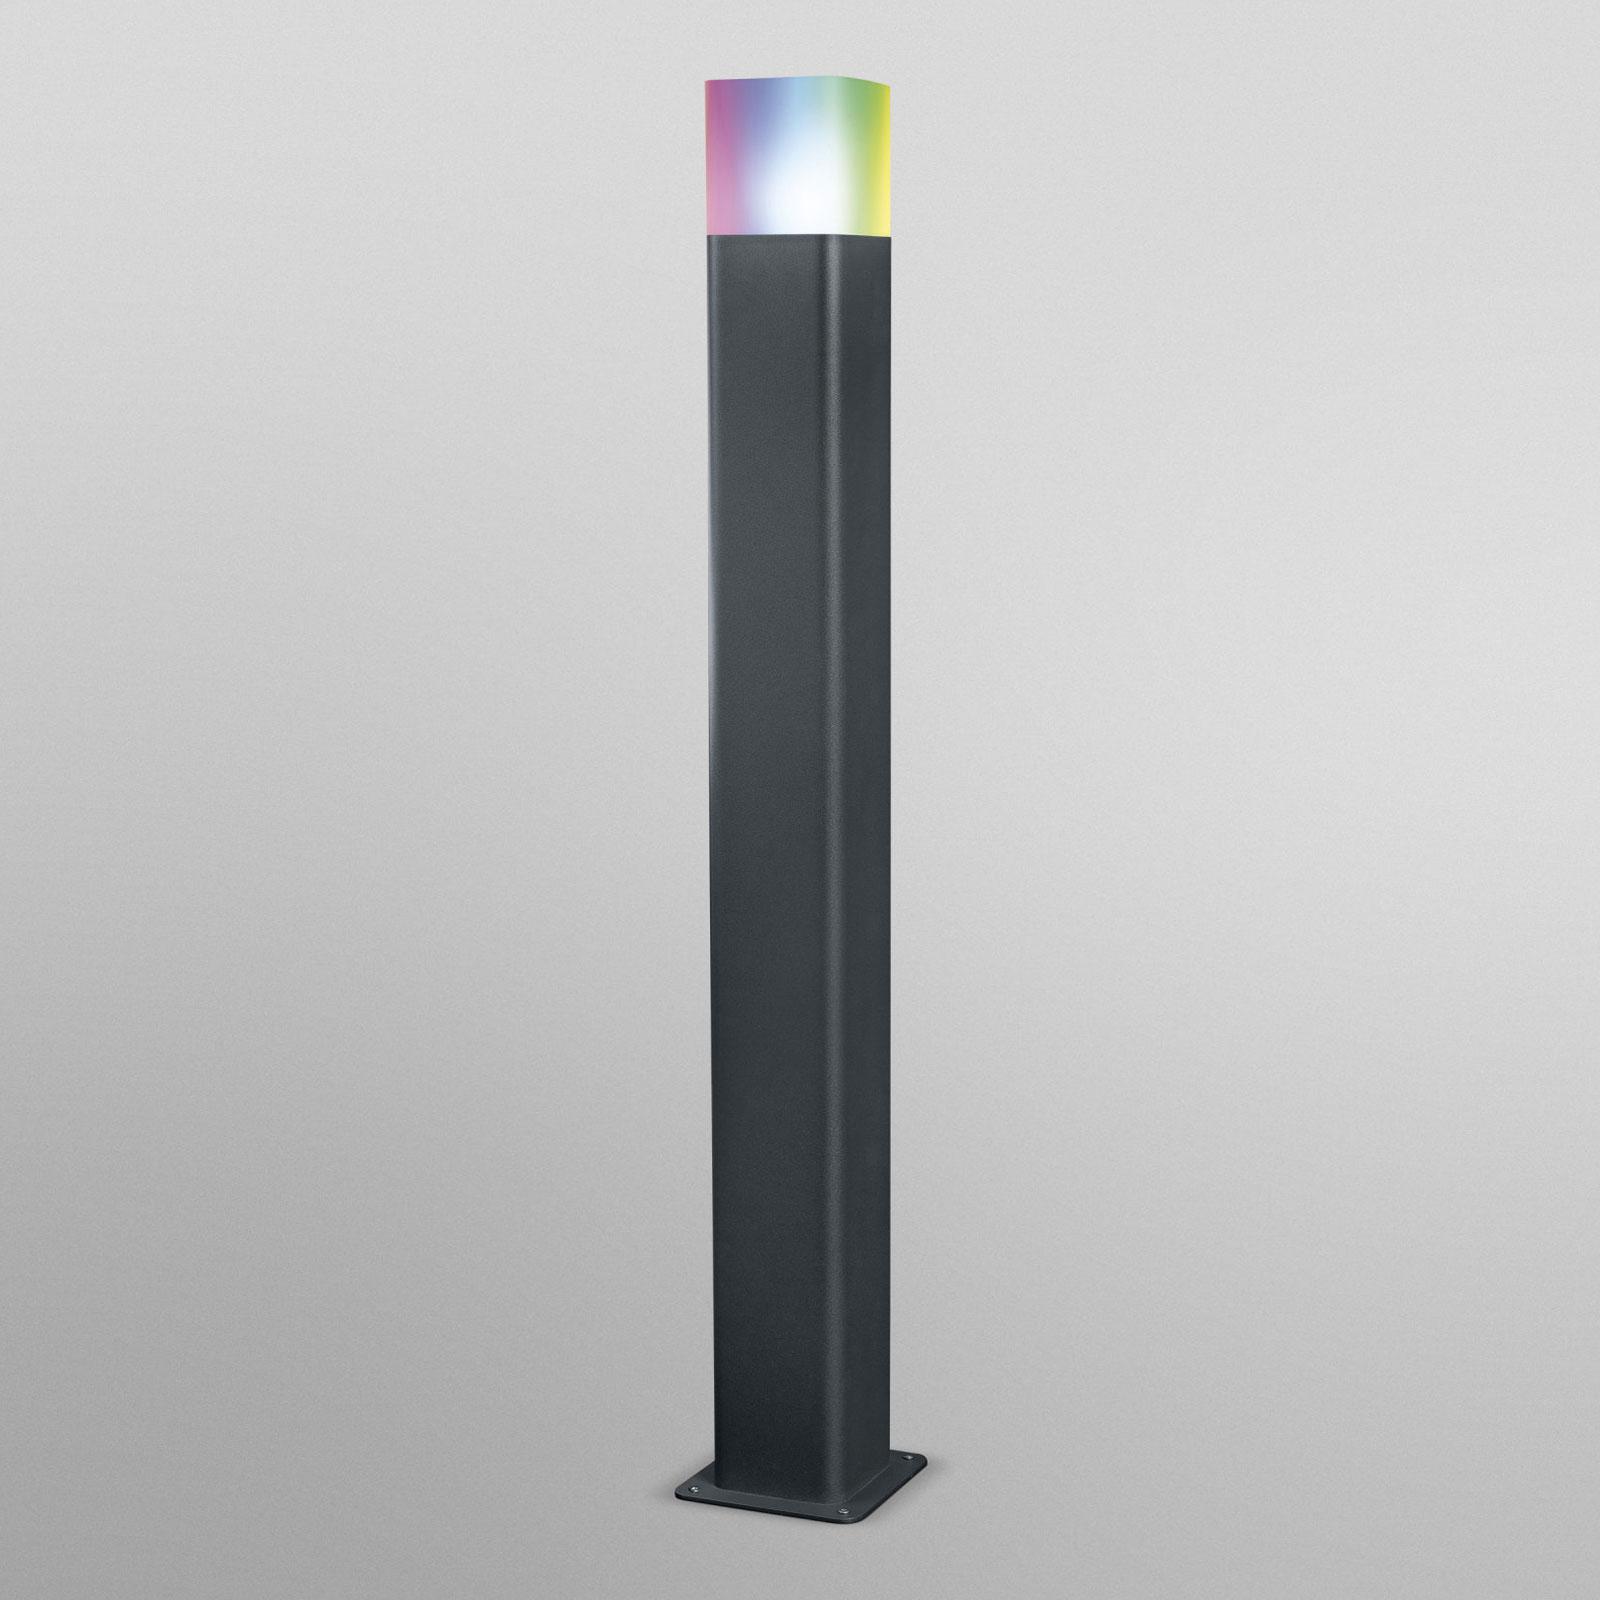 LEDVANCE SMART+ WiFi Cube veilampe RGBW 80 cm